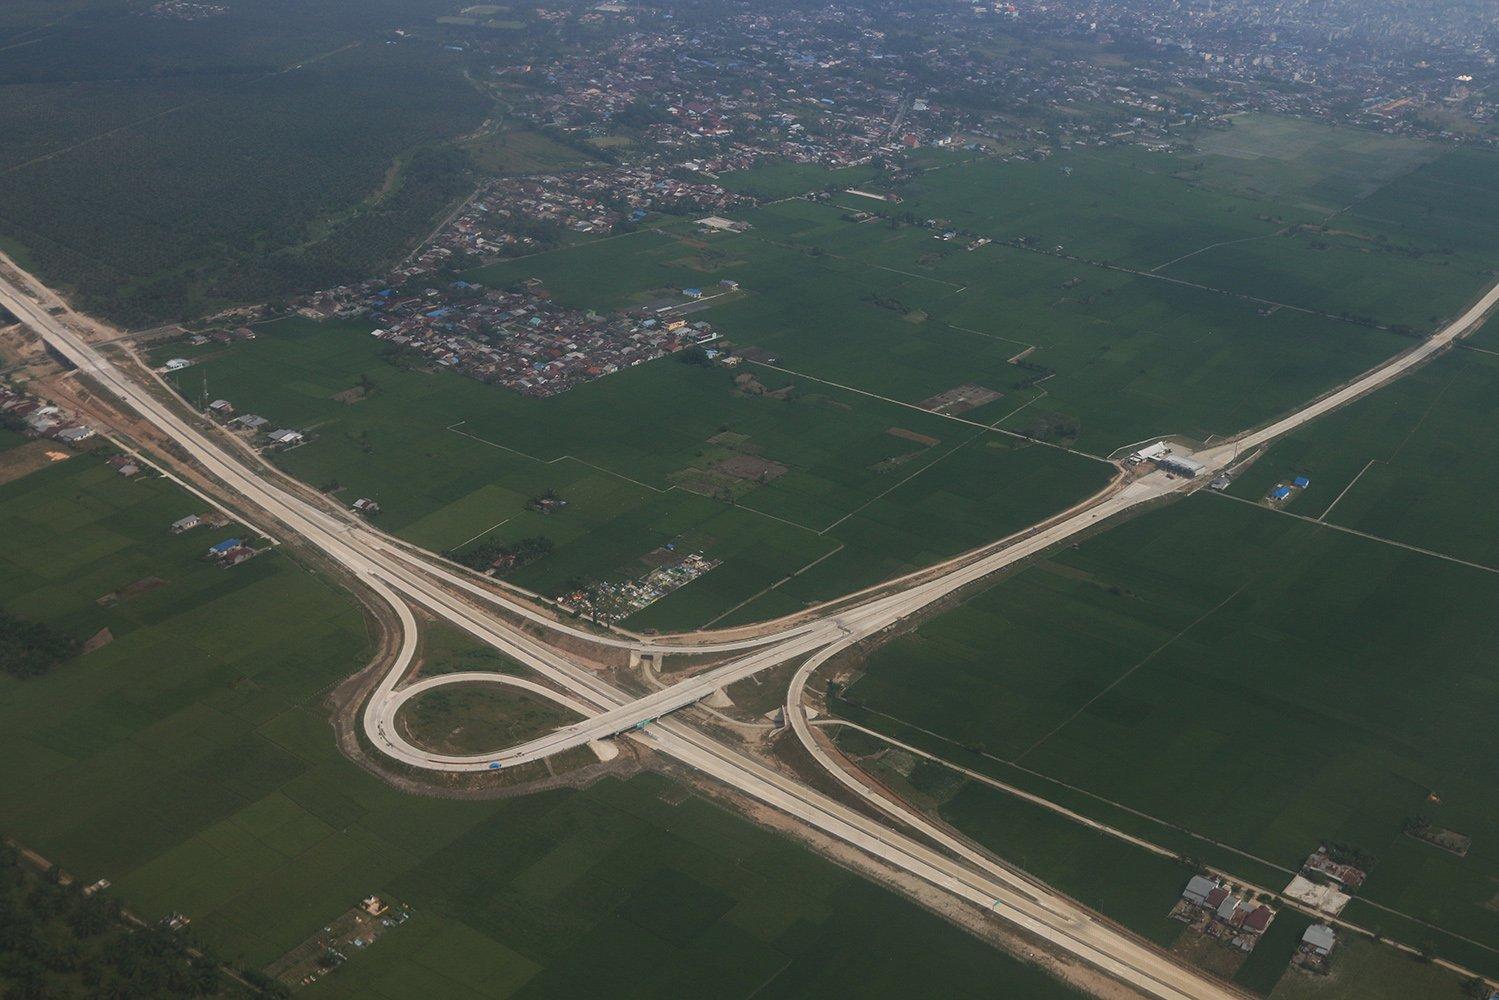 Foto udara pembangunan jalan tol Medan-Binjai, Sumatera Utara, Sabtu (6/5).